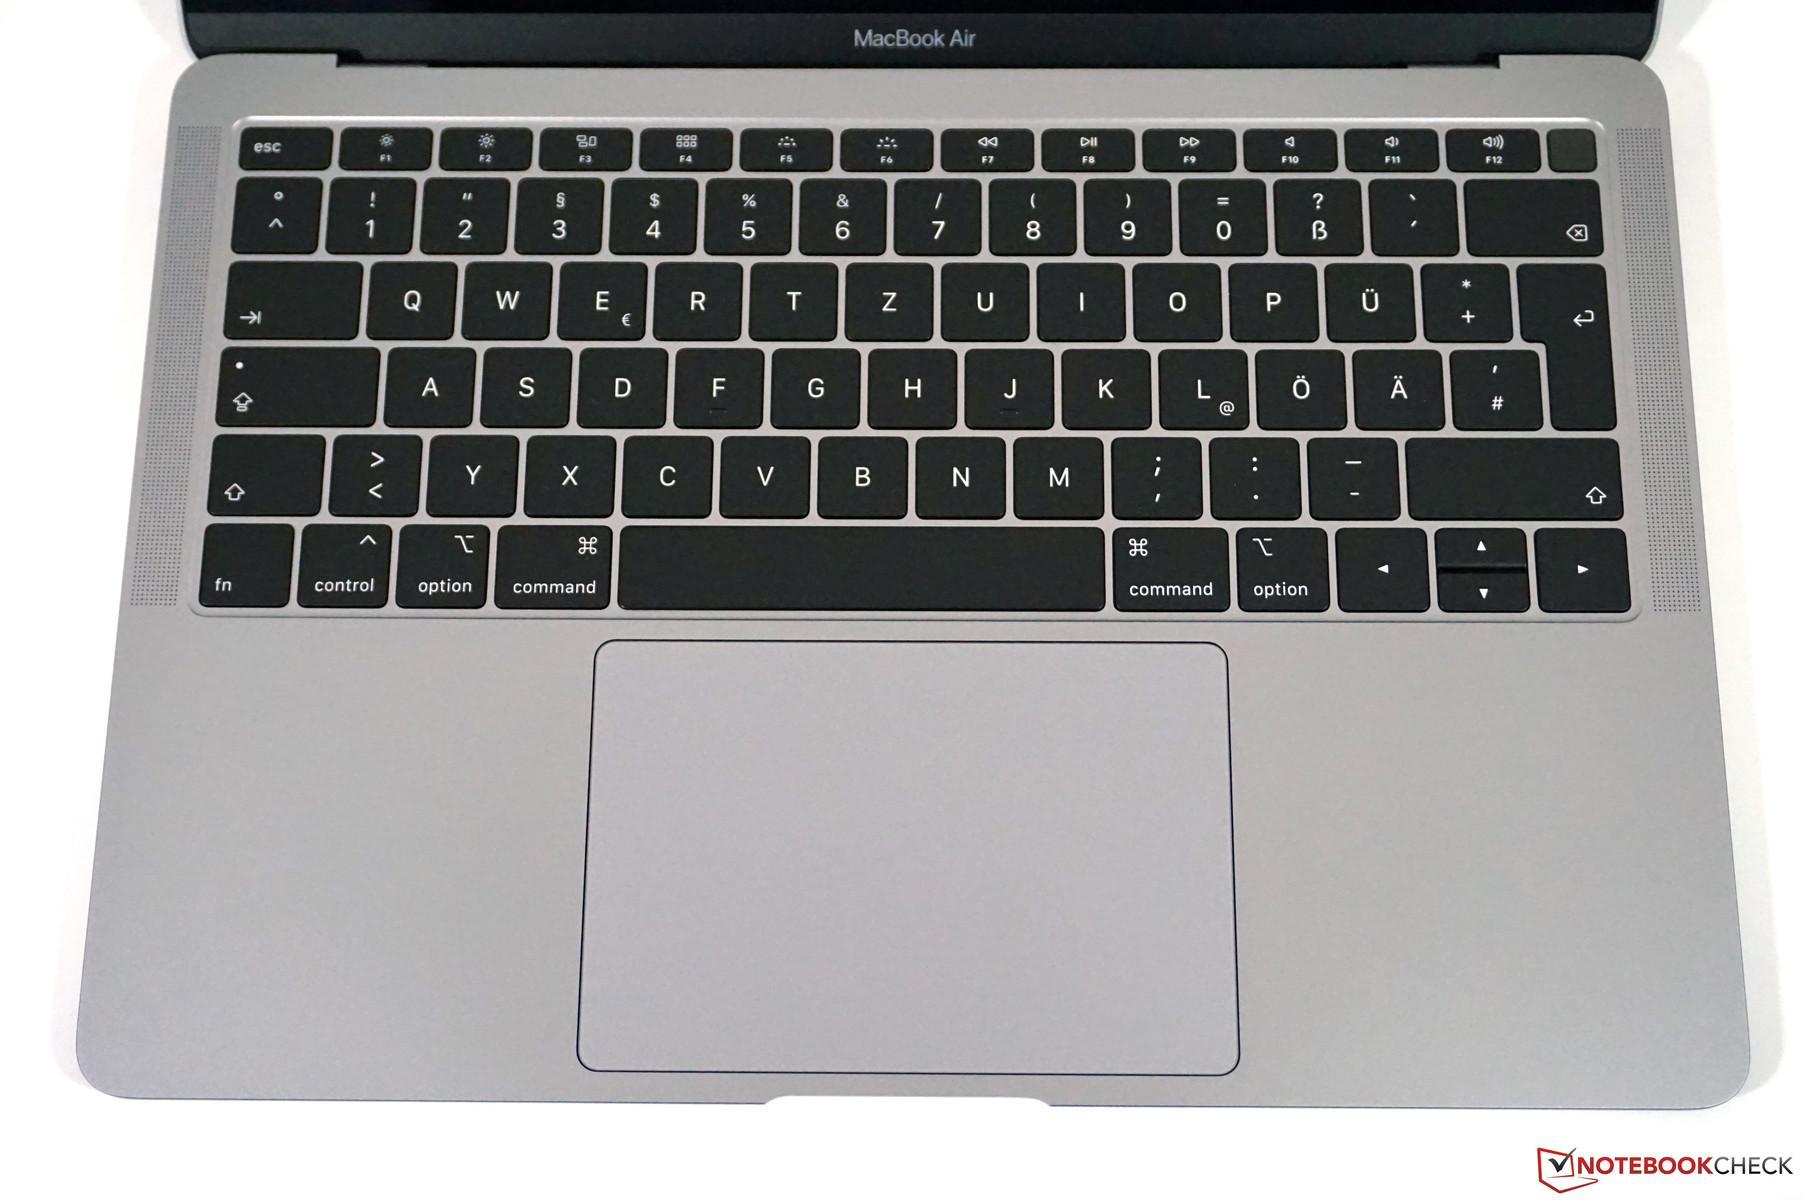 Apple MacBook Air 2018 (i5, 256 GB) Laptop Review